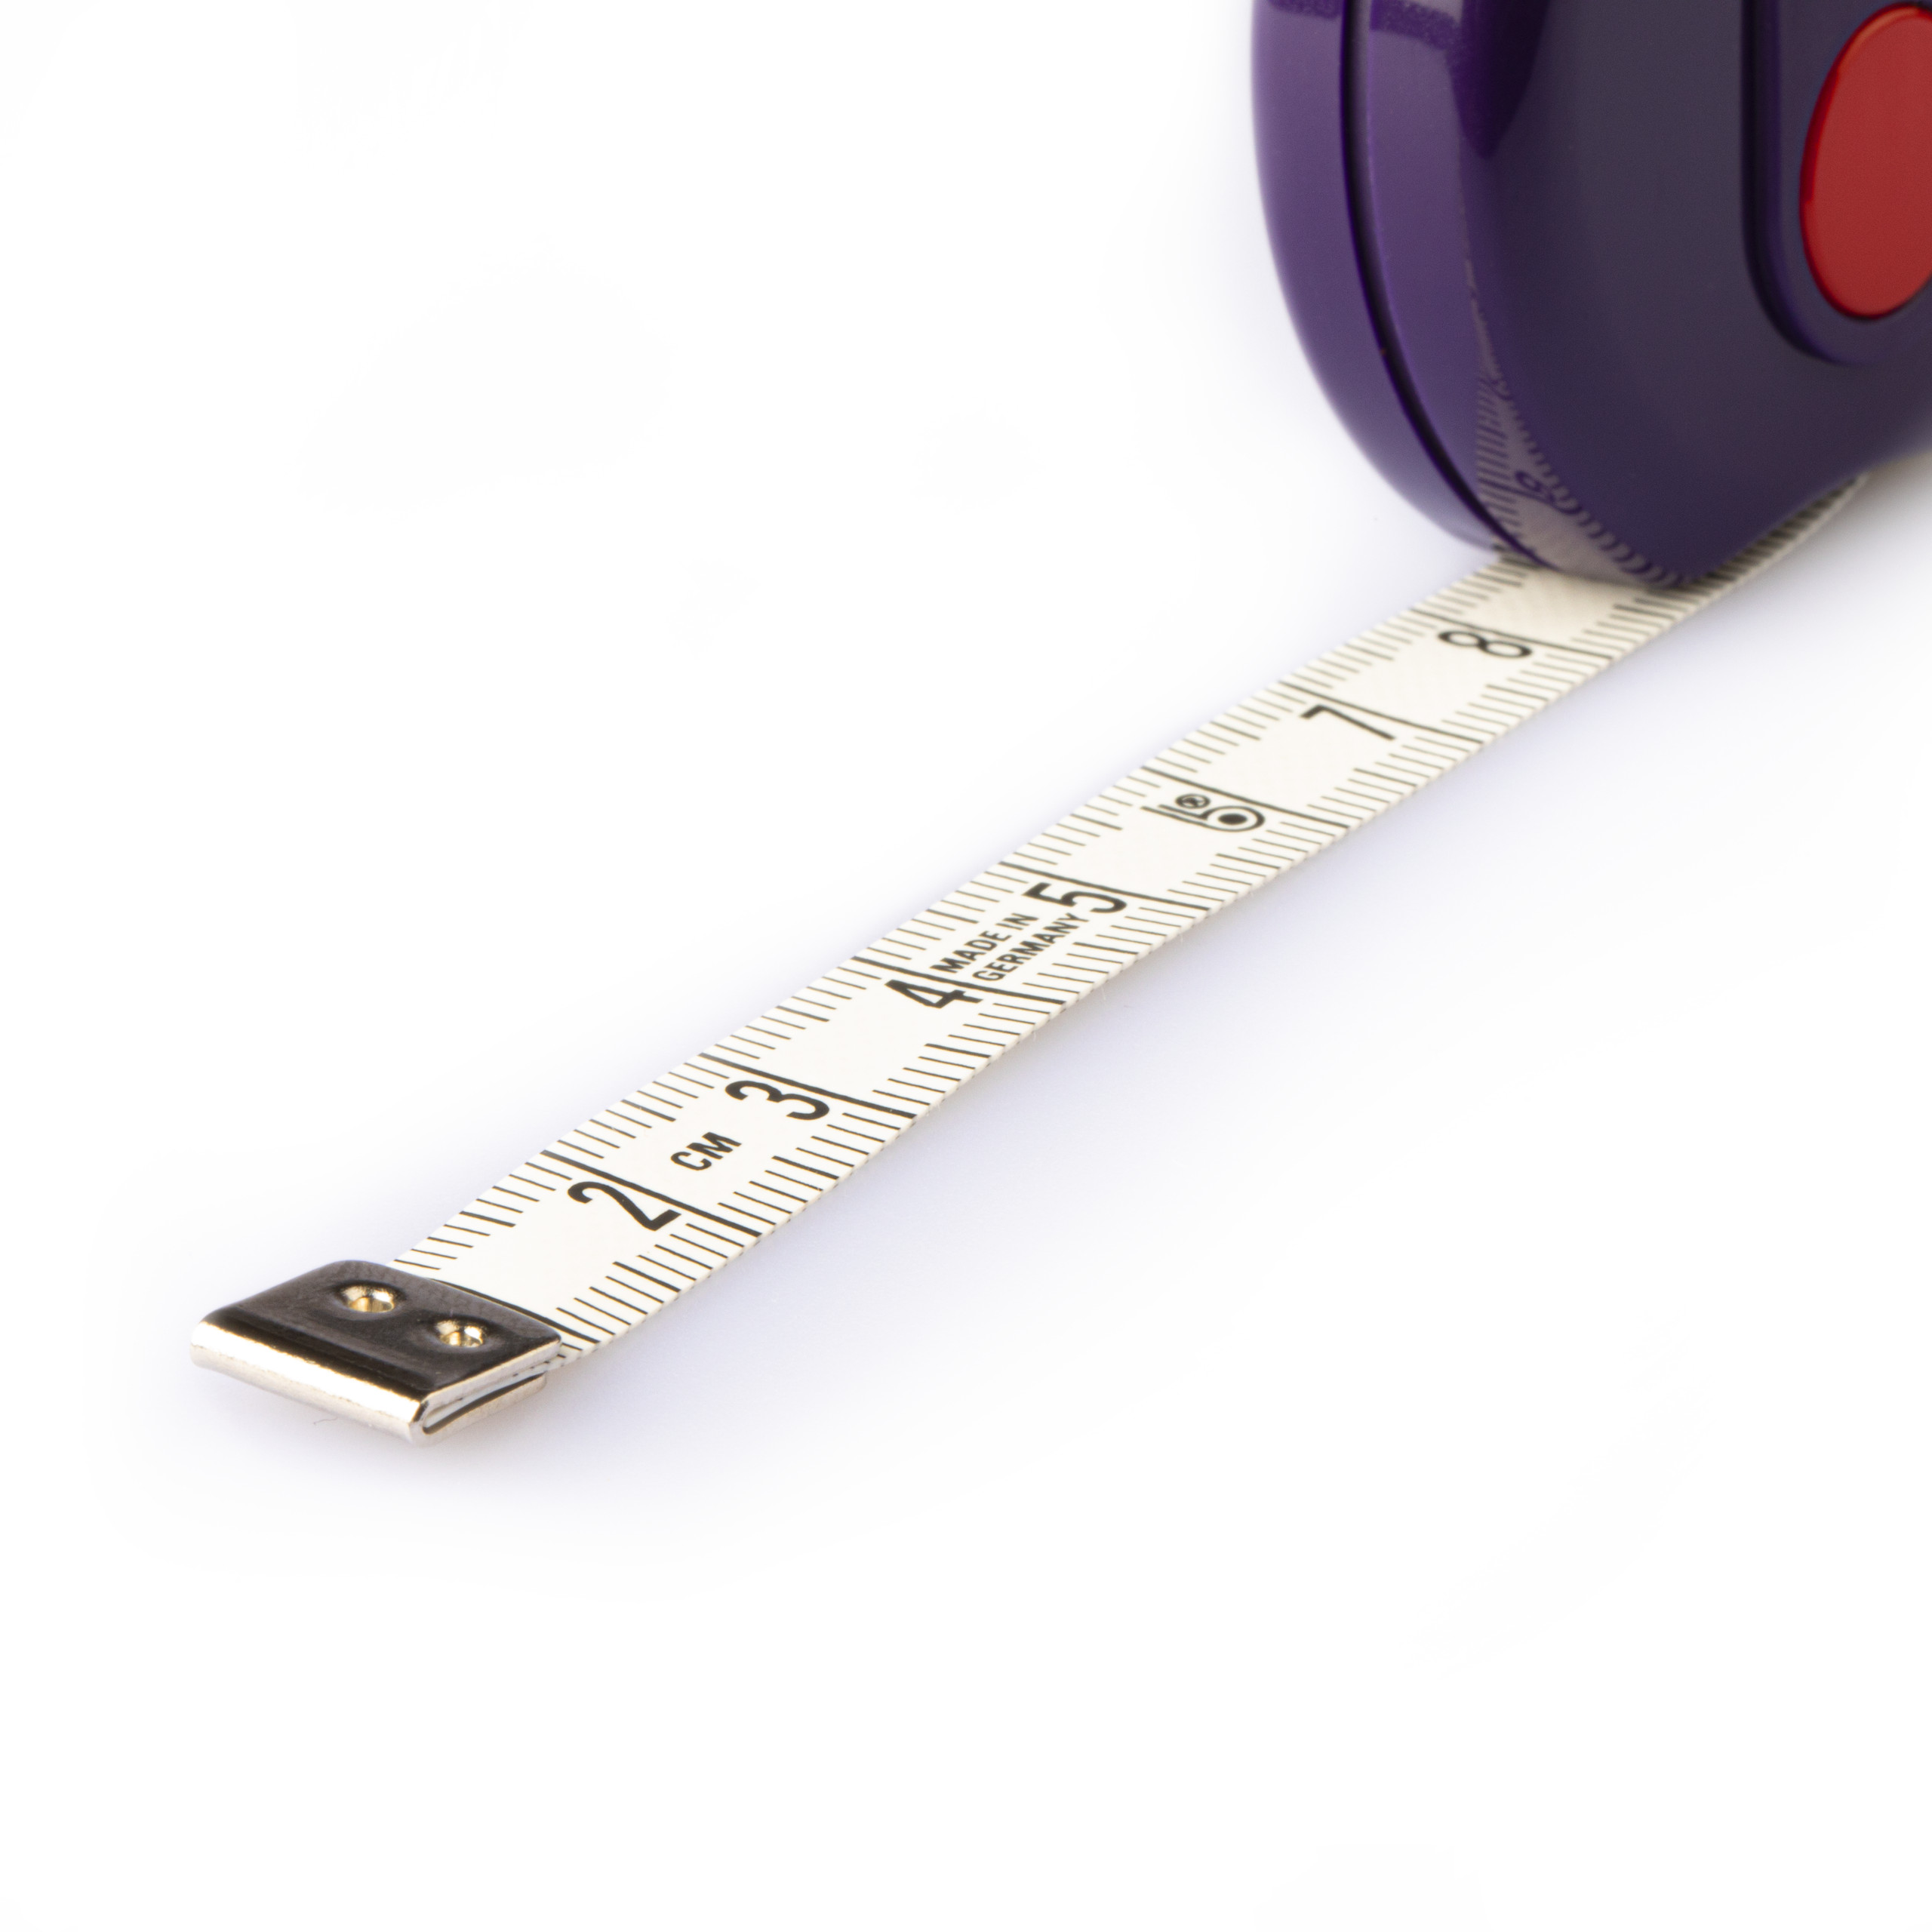 Maßband Mini, violett, 150 cm, Prym - Art. 282209